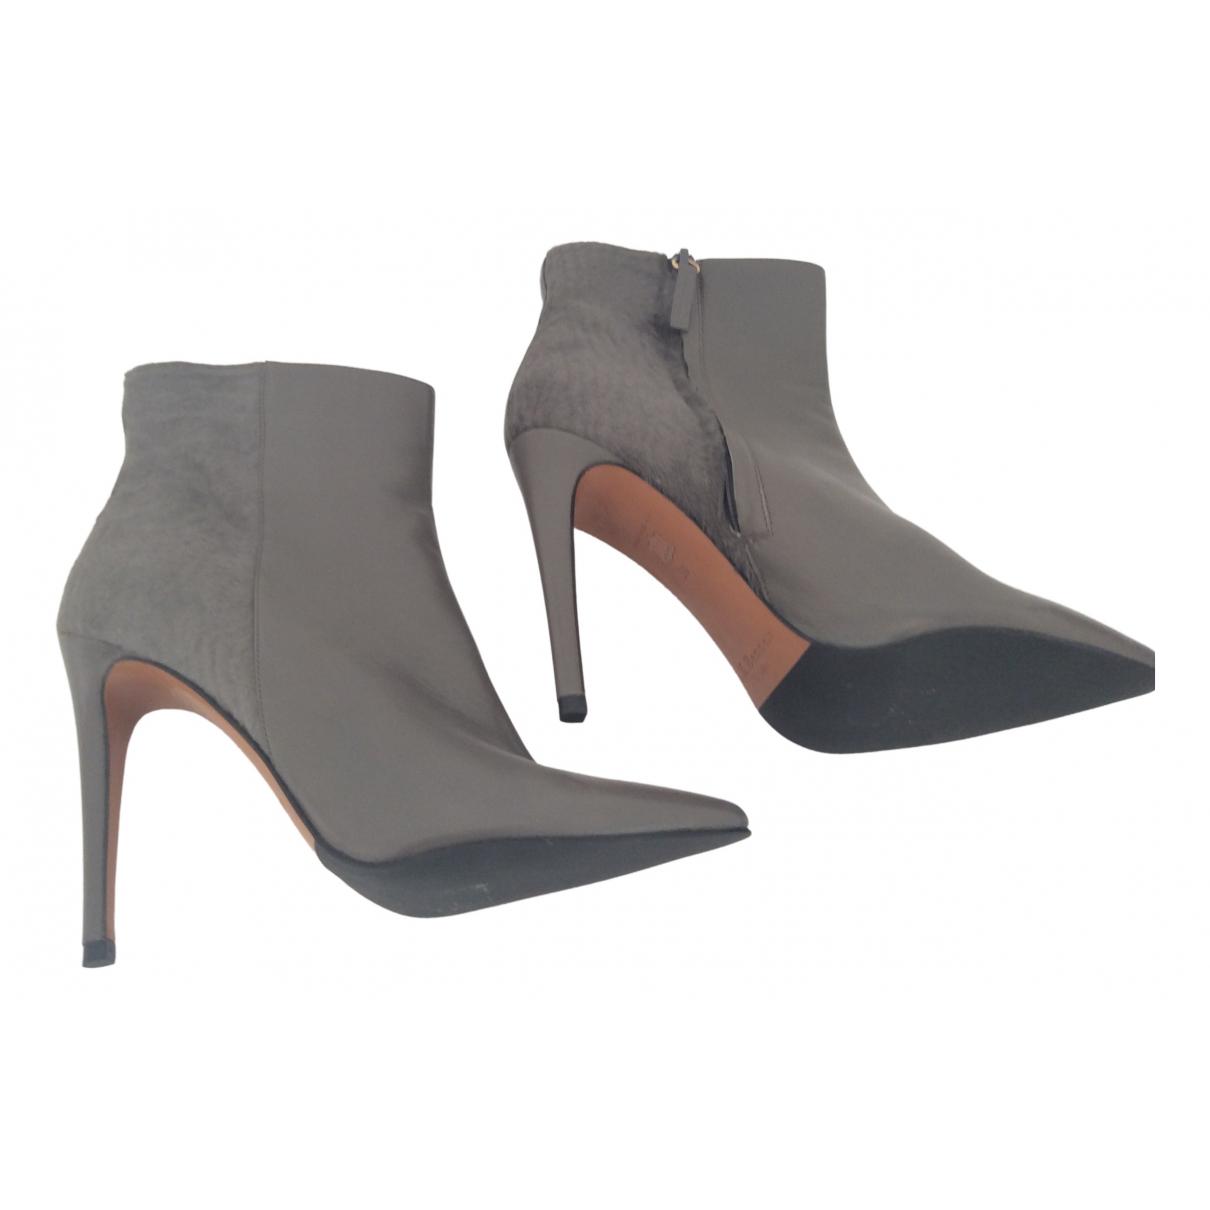 Lk Bennett \N Grey Leather Ankle boots for Women 6 UK